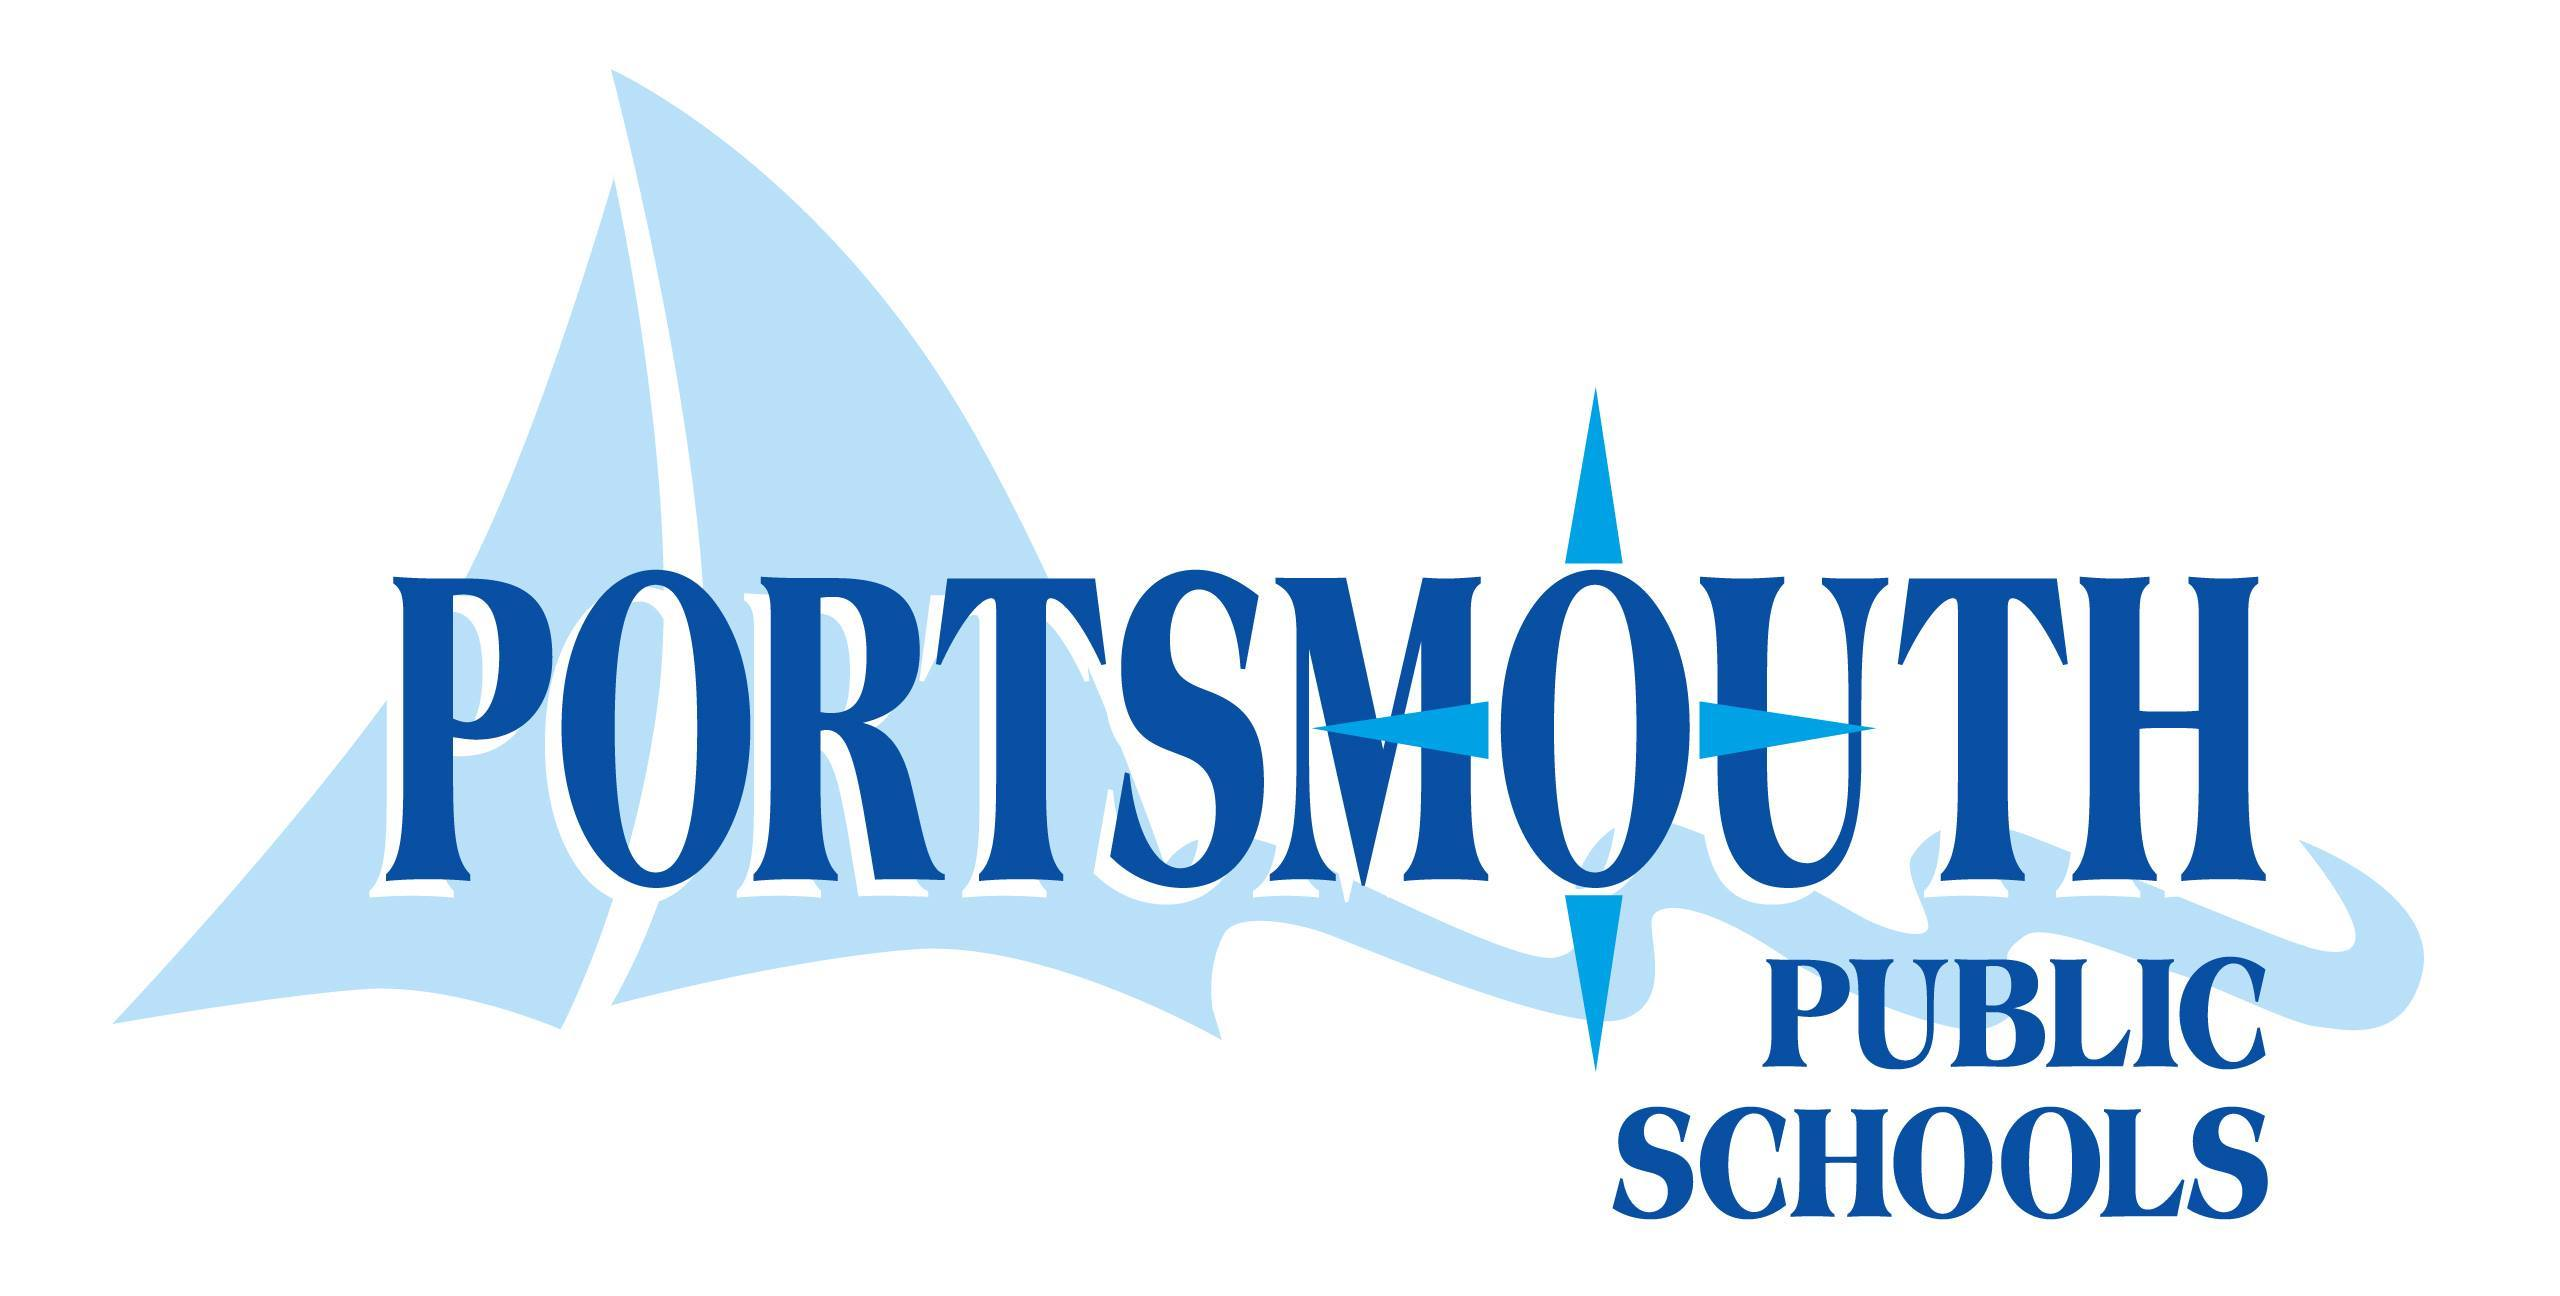 portsmouth public schools generic logo_1553290884827.jpg.jpg